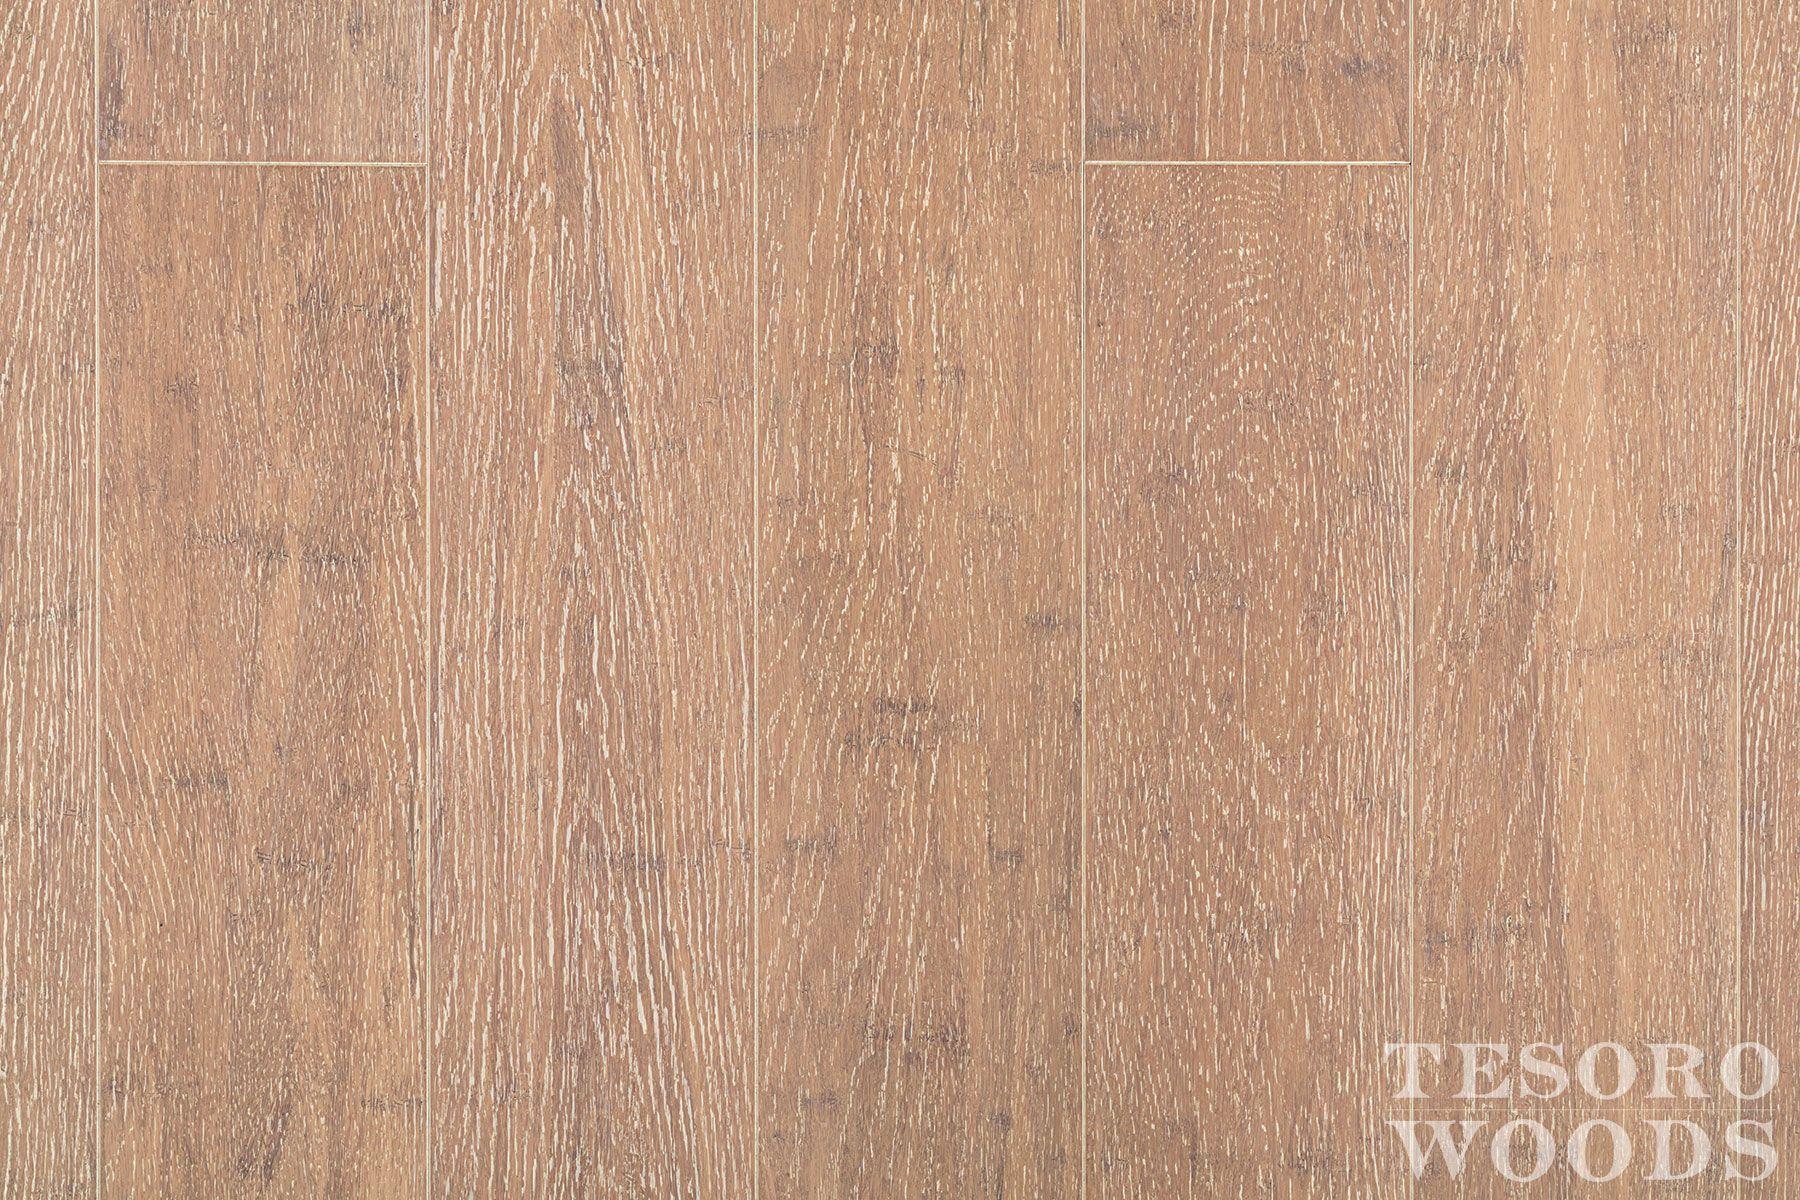 Super Strand Bamboo Fawn Wood Floors Strand Bamboo Flooring